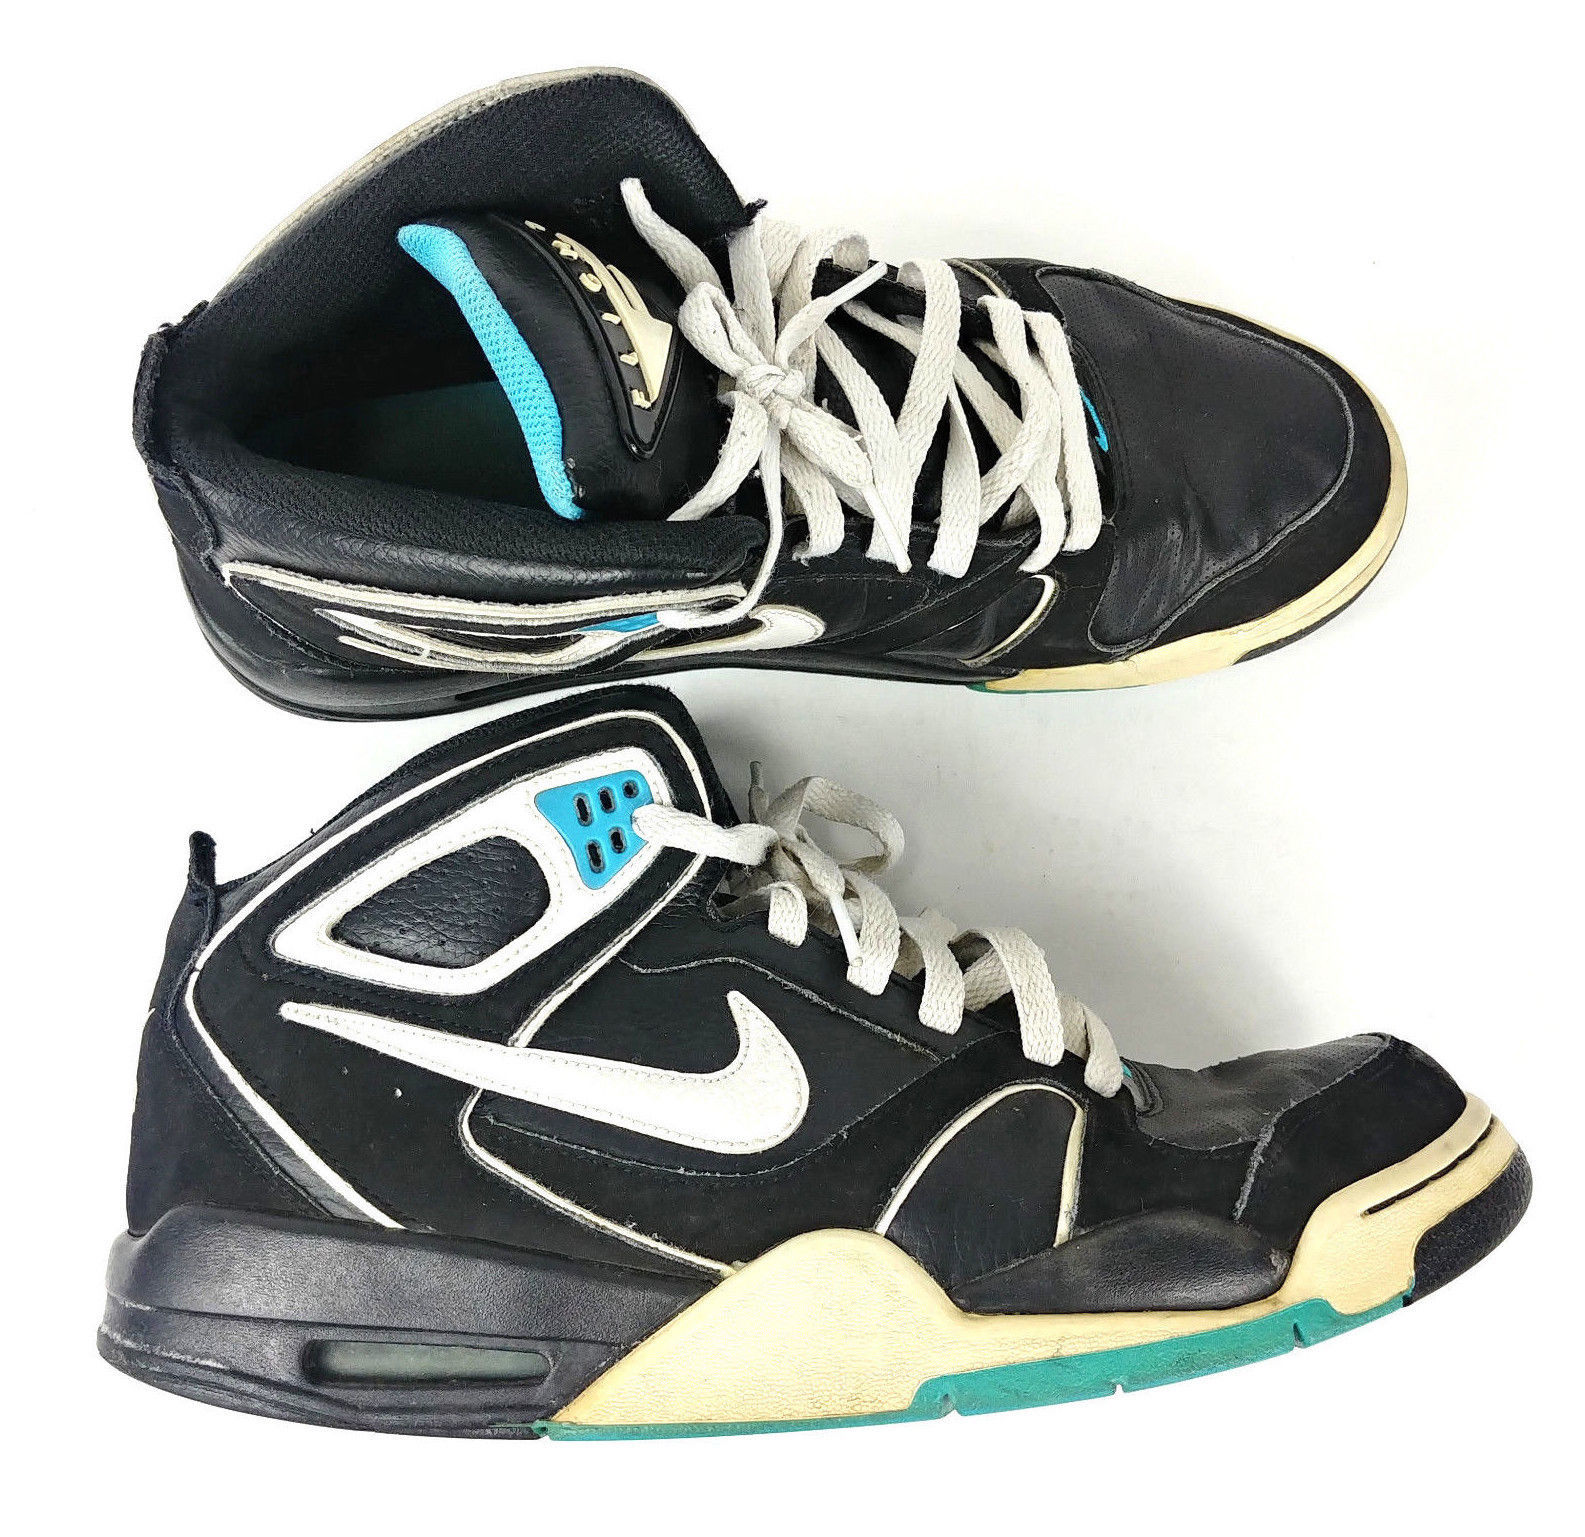 ad859437ed5fb 57. 57. Nike Air Flight Mens Falcon Shoes 397204-041 Sz 9.5 Black White  Blue Sneakers · Nike Air Flight ...